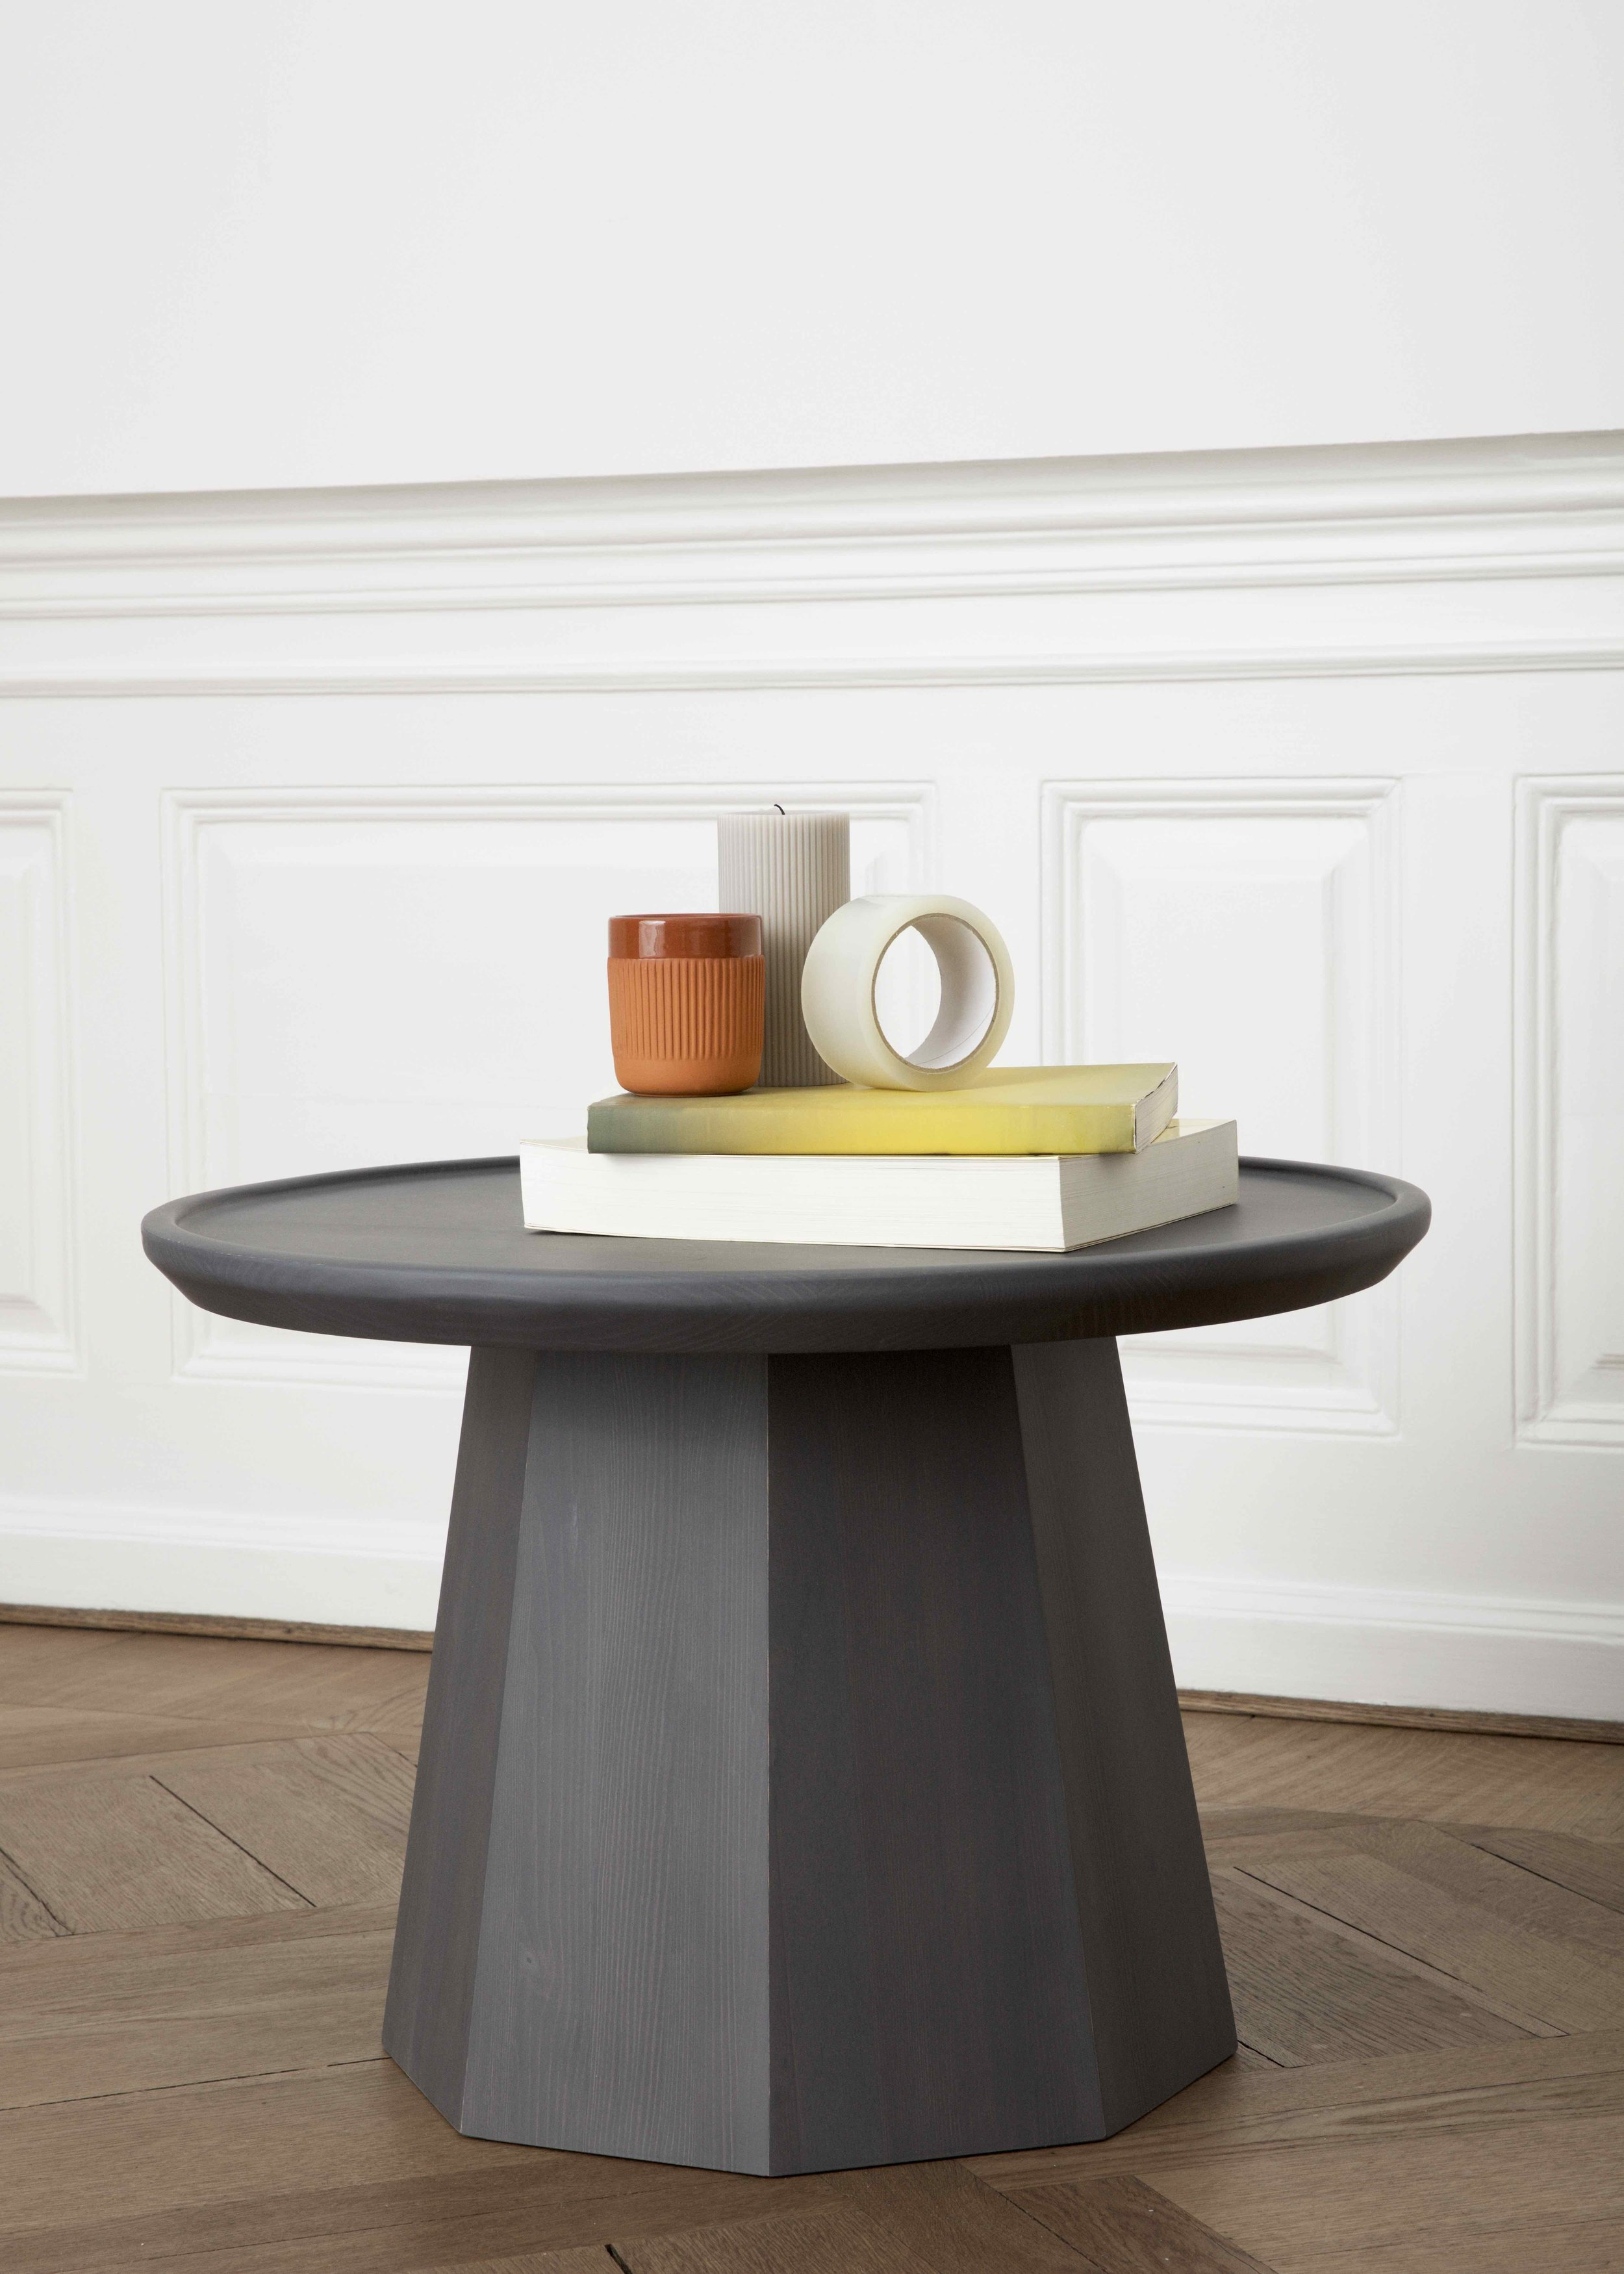 602549_Normann_Copenhagen_Pine_Table_Large_Dark_Grey_03 copy.jpg